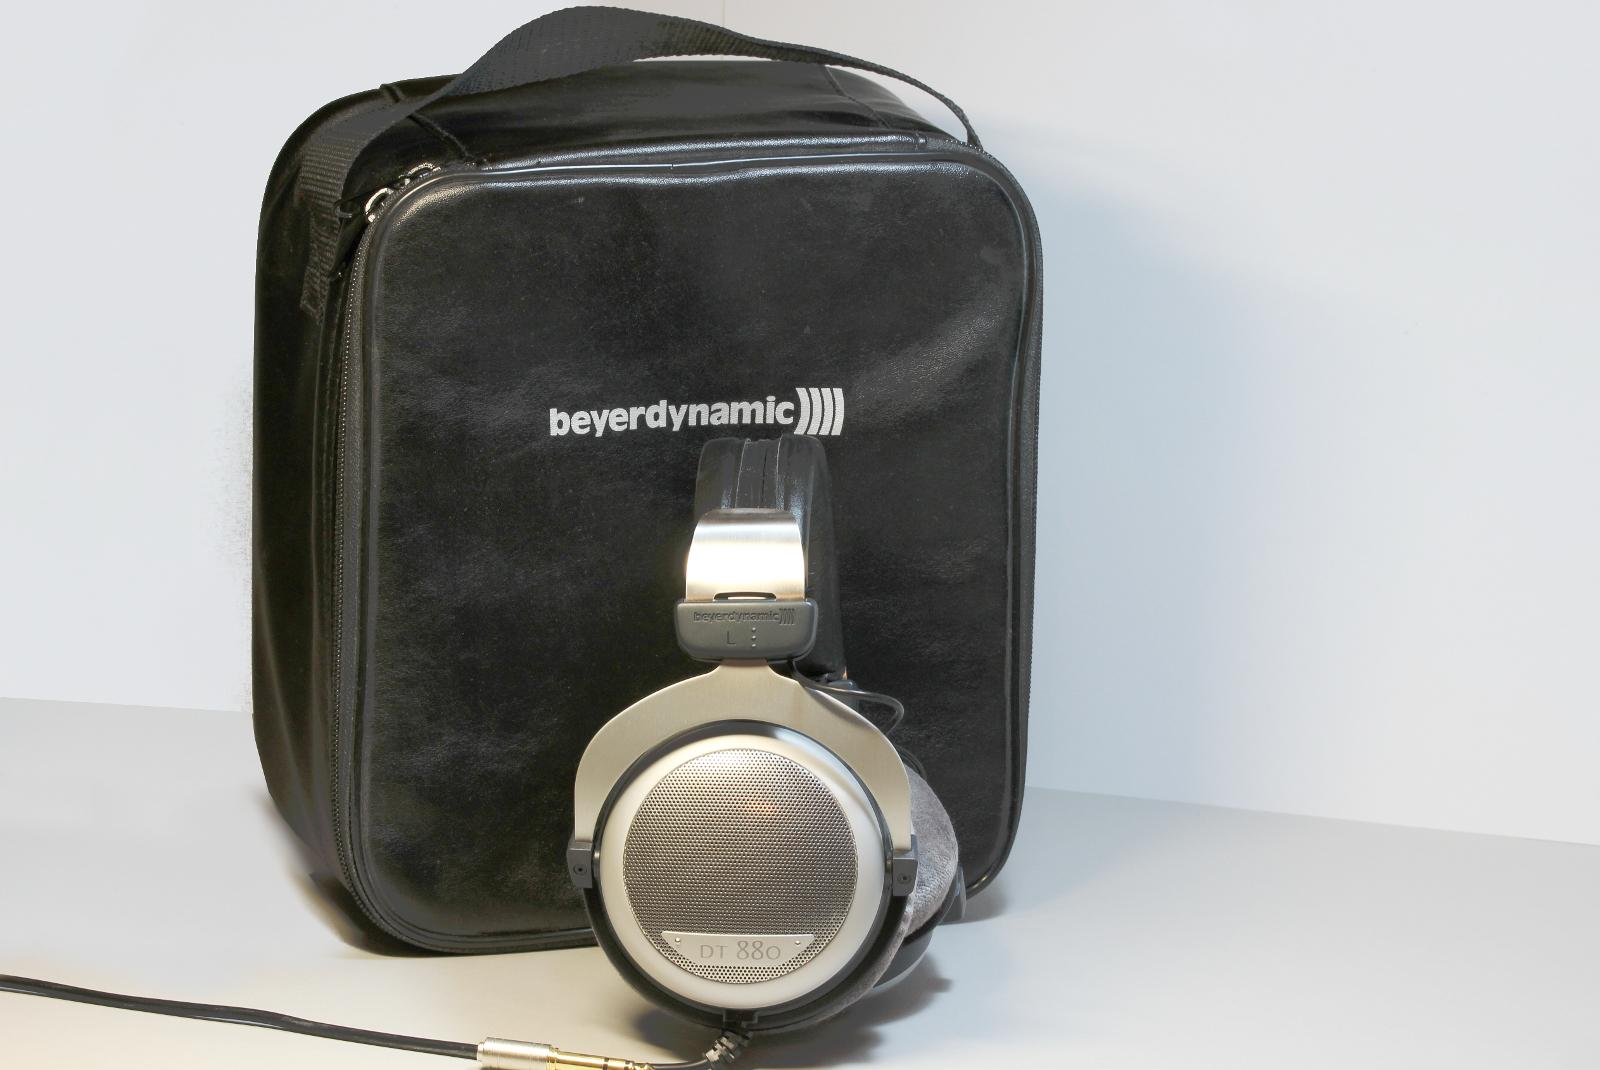 Transporttasche Beyerdynamic DT 880 Edition Kopfhörer